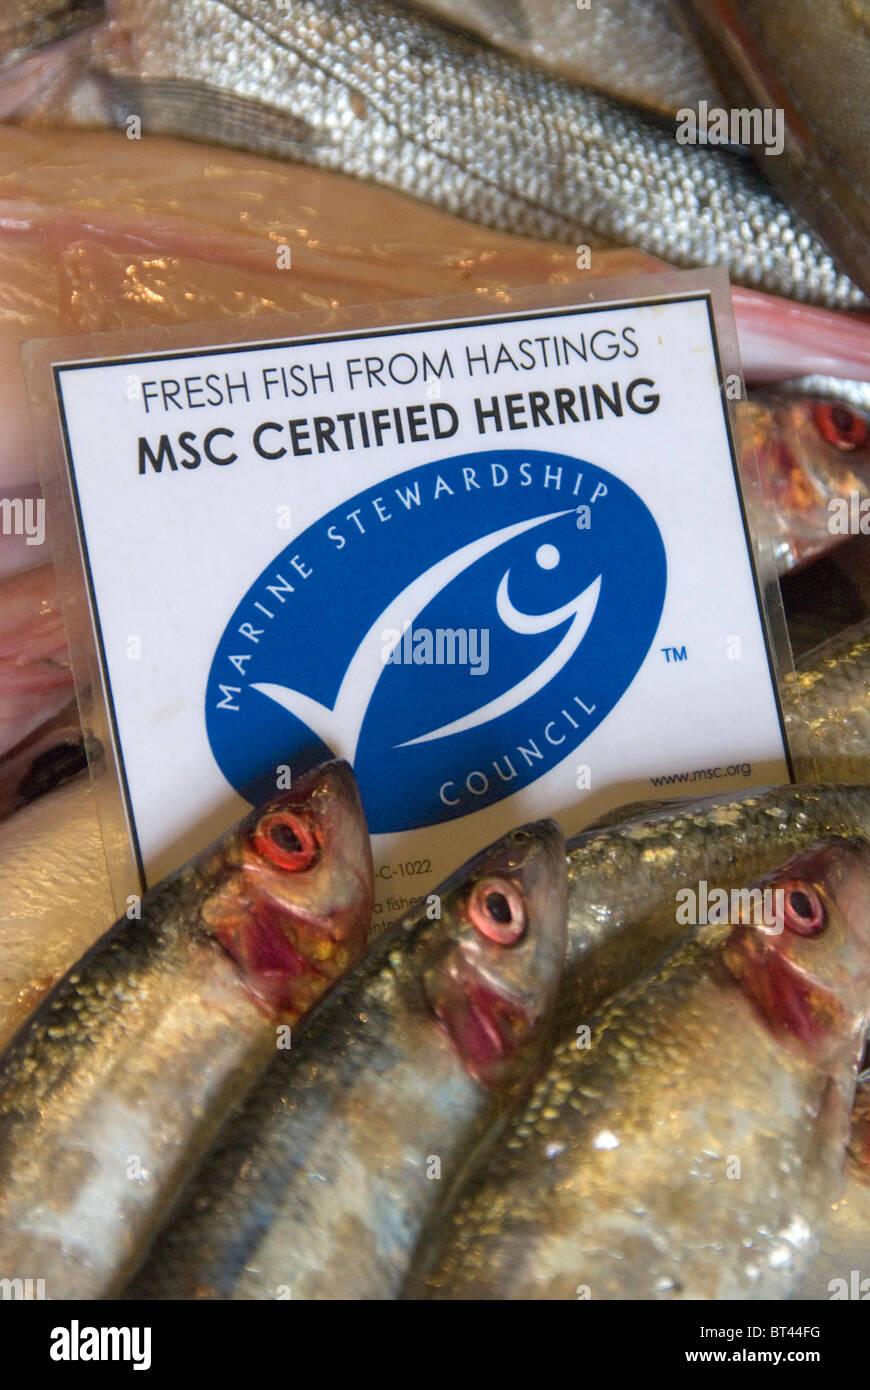 Hastings Frischfisch Marine Stewardship Council zertifiziert nachhaltigen Hering zum Verkauf an Rock-a-Nore Fischerei Stockbild